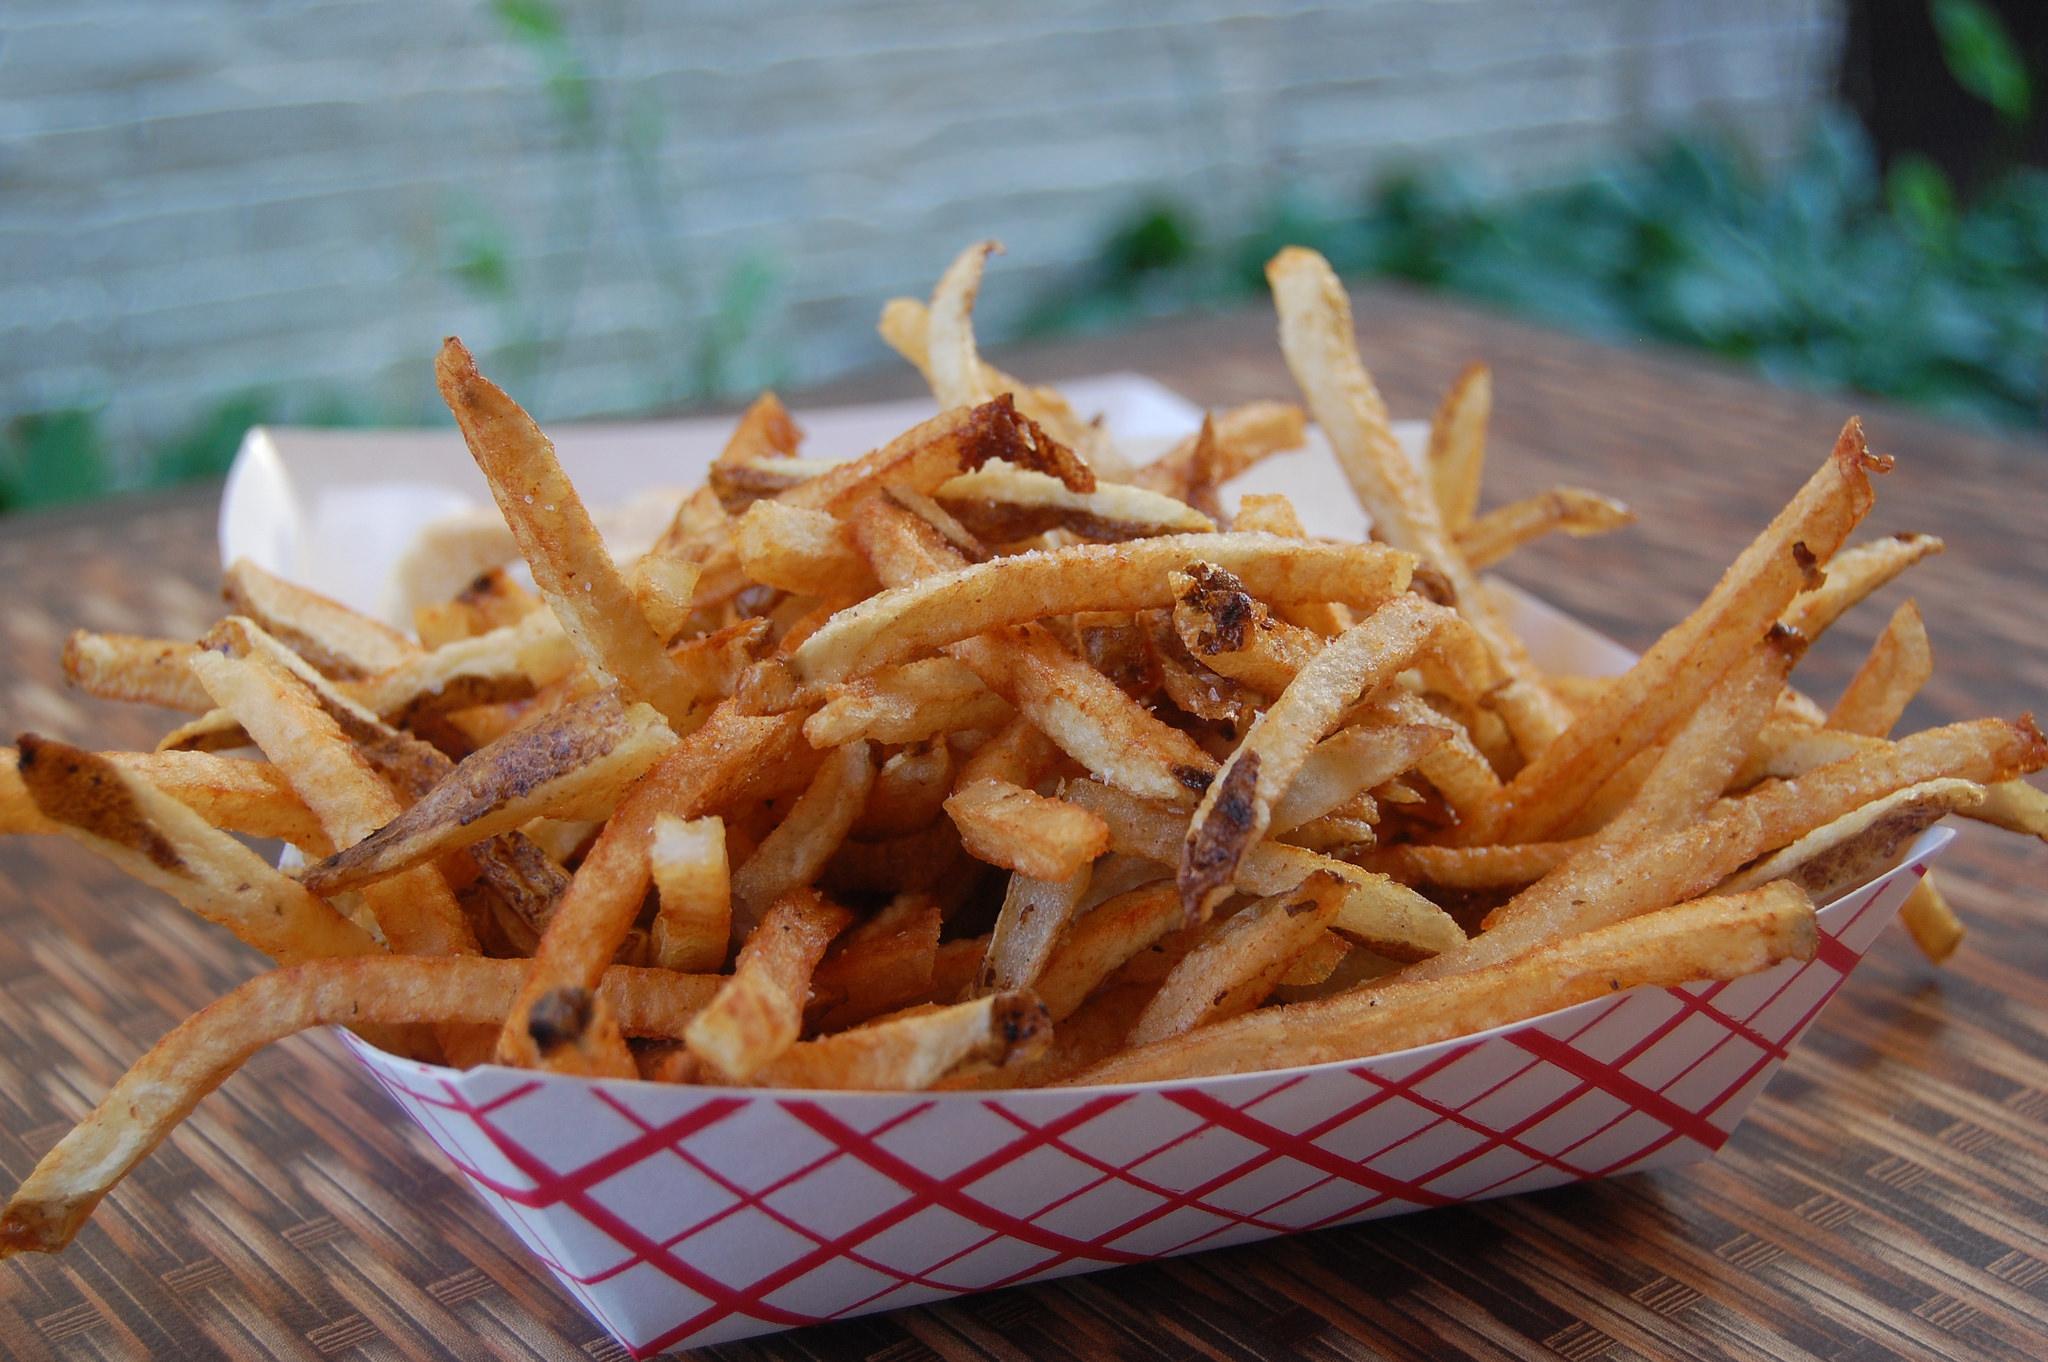 fries | © stu_spivack/Flickr